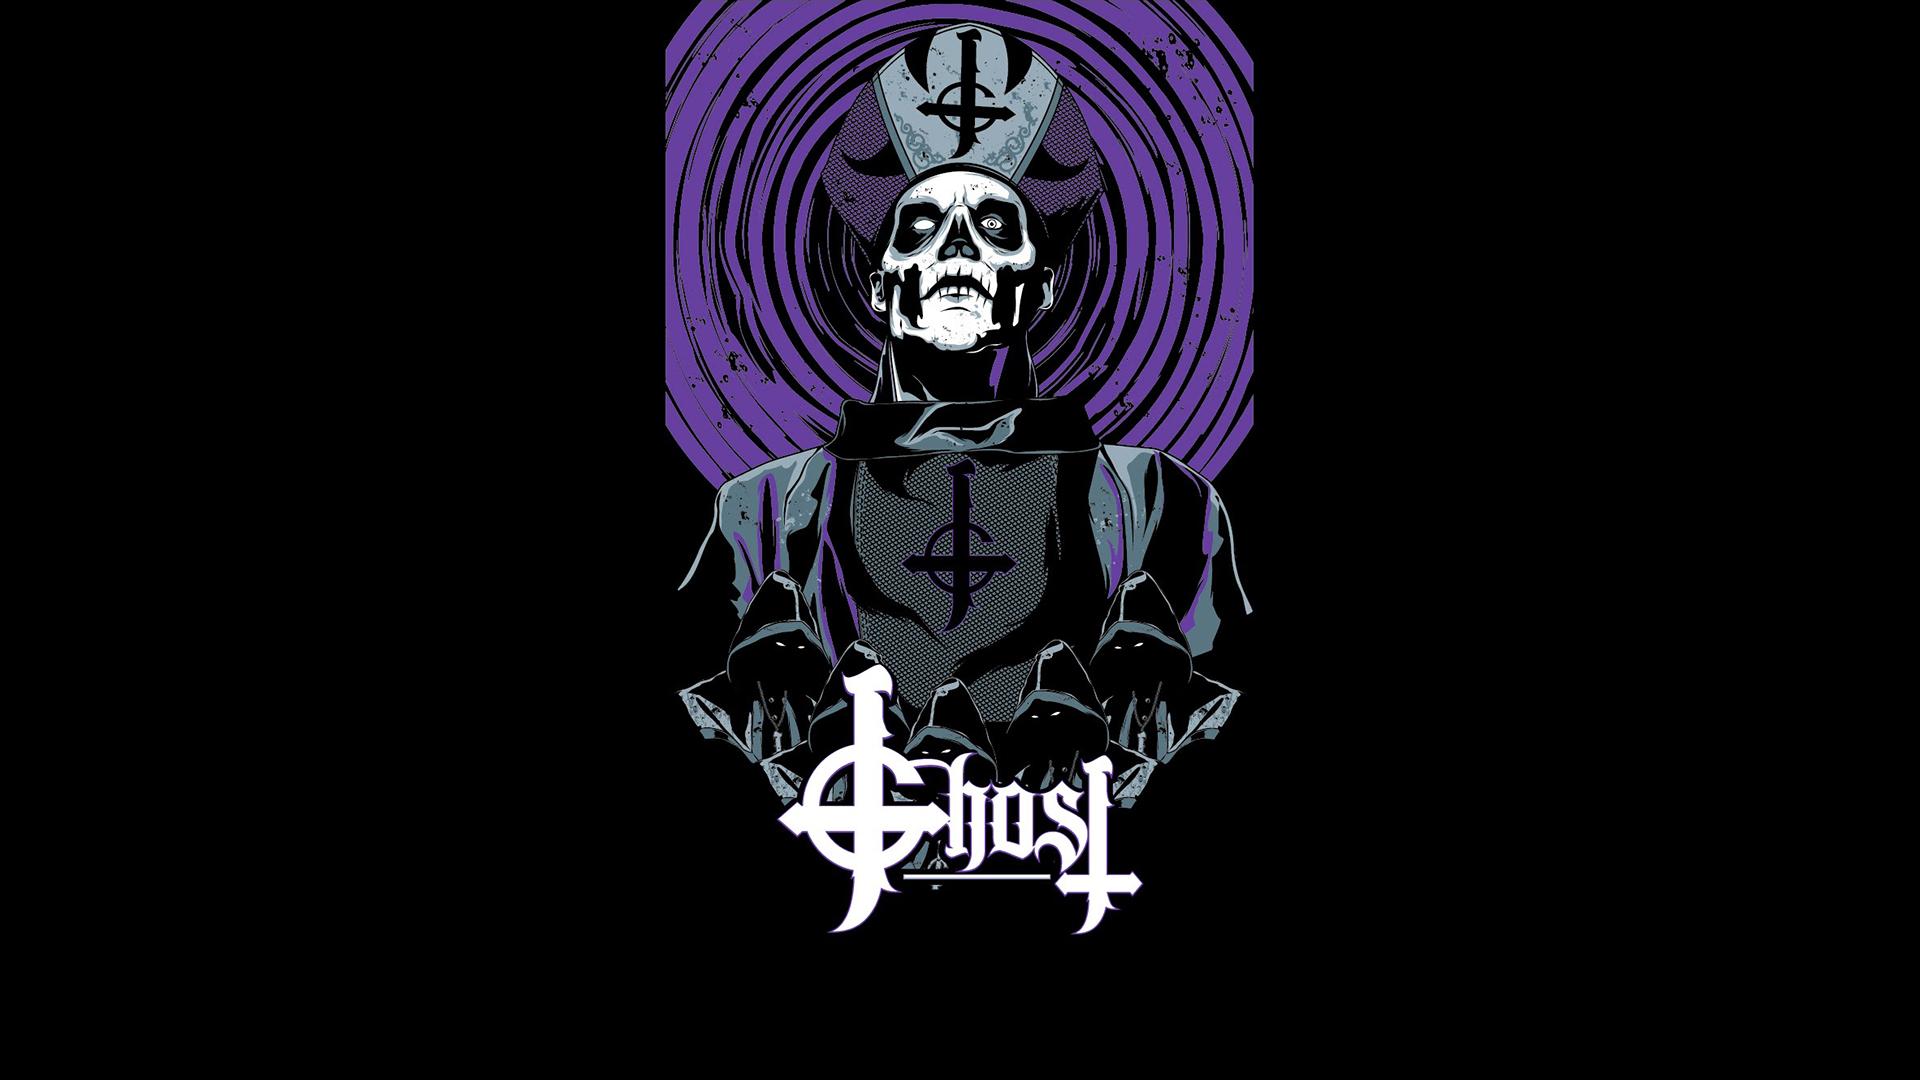 Ghost B C Ghost Papa Emeritus Purple Wallpaper Resolution 1920x1080 Id 237610 Wallha Com